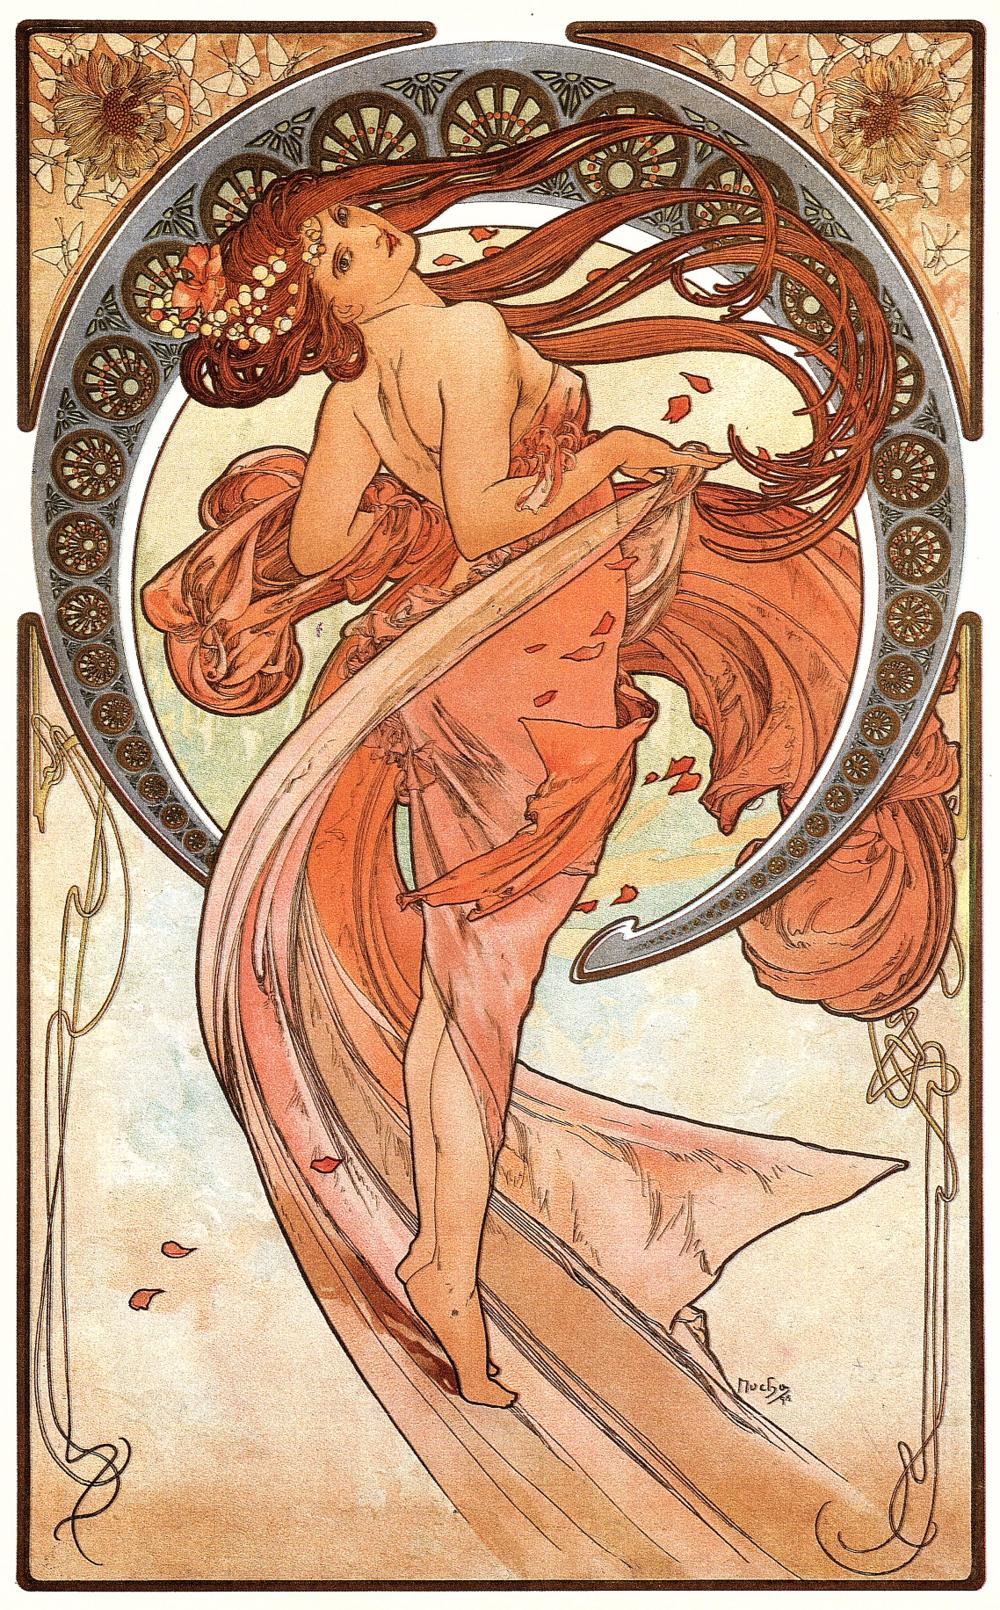 Concept art by Alphonse Mucha.